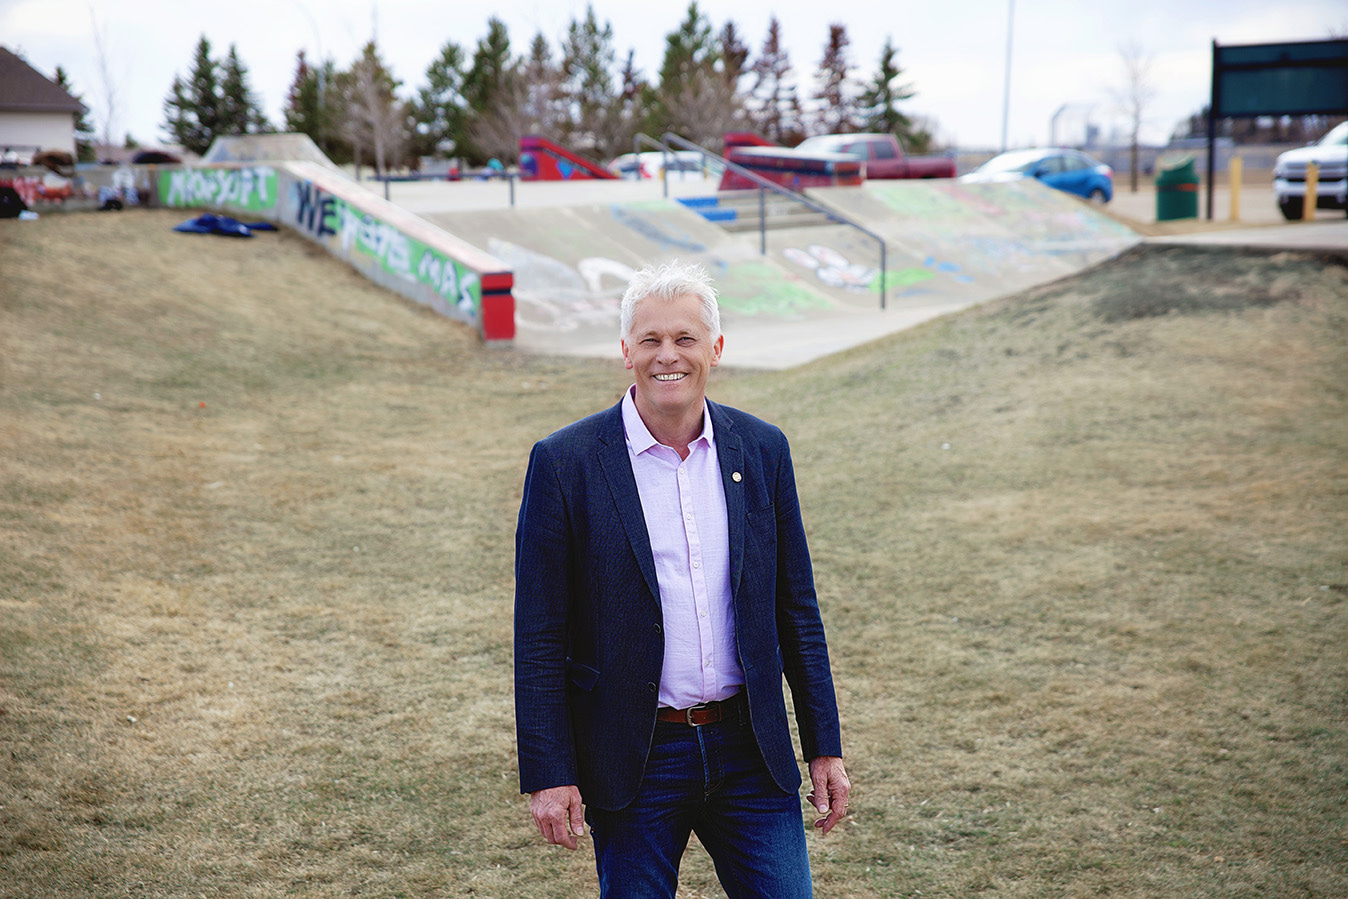 Man standing in skate park